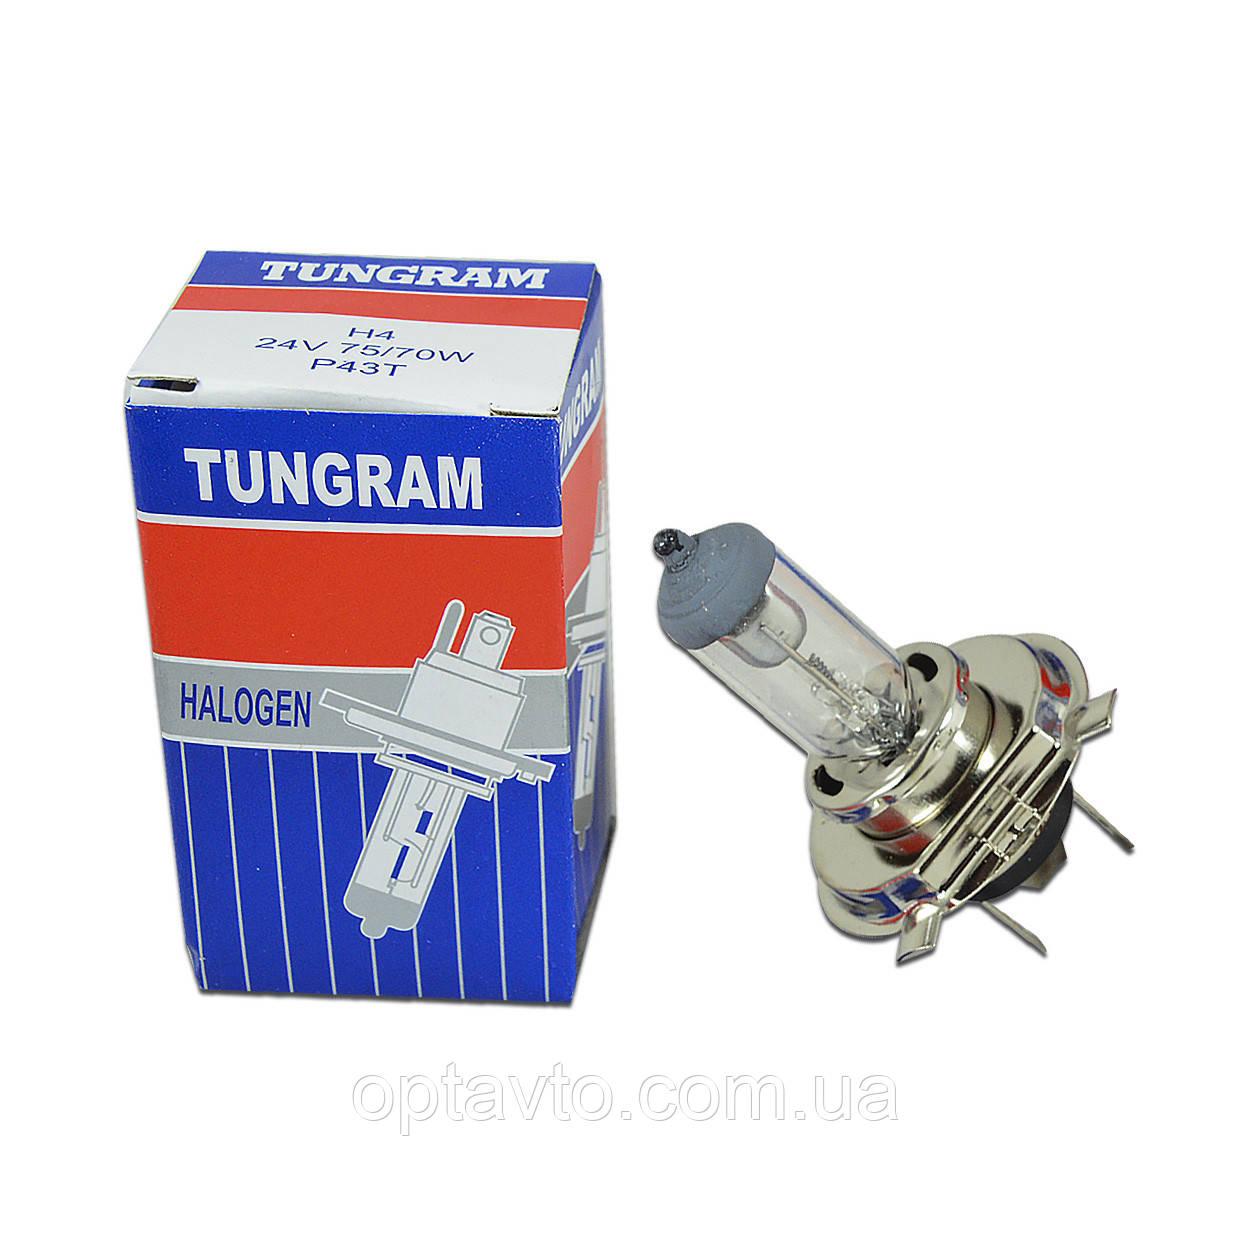 Грузовик H4 24V 75/70W  P43t Лампа TUNGRAM Strong Ligt